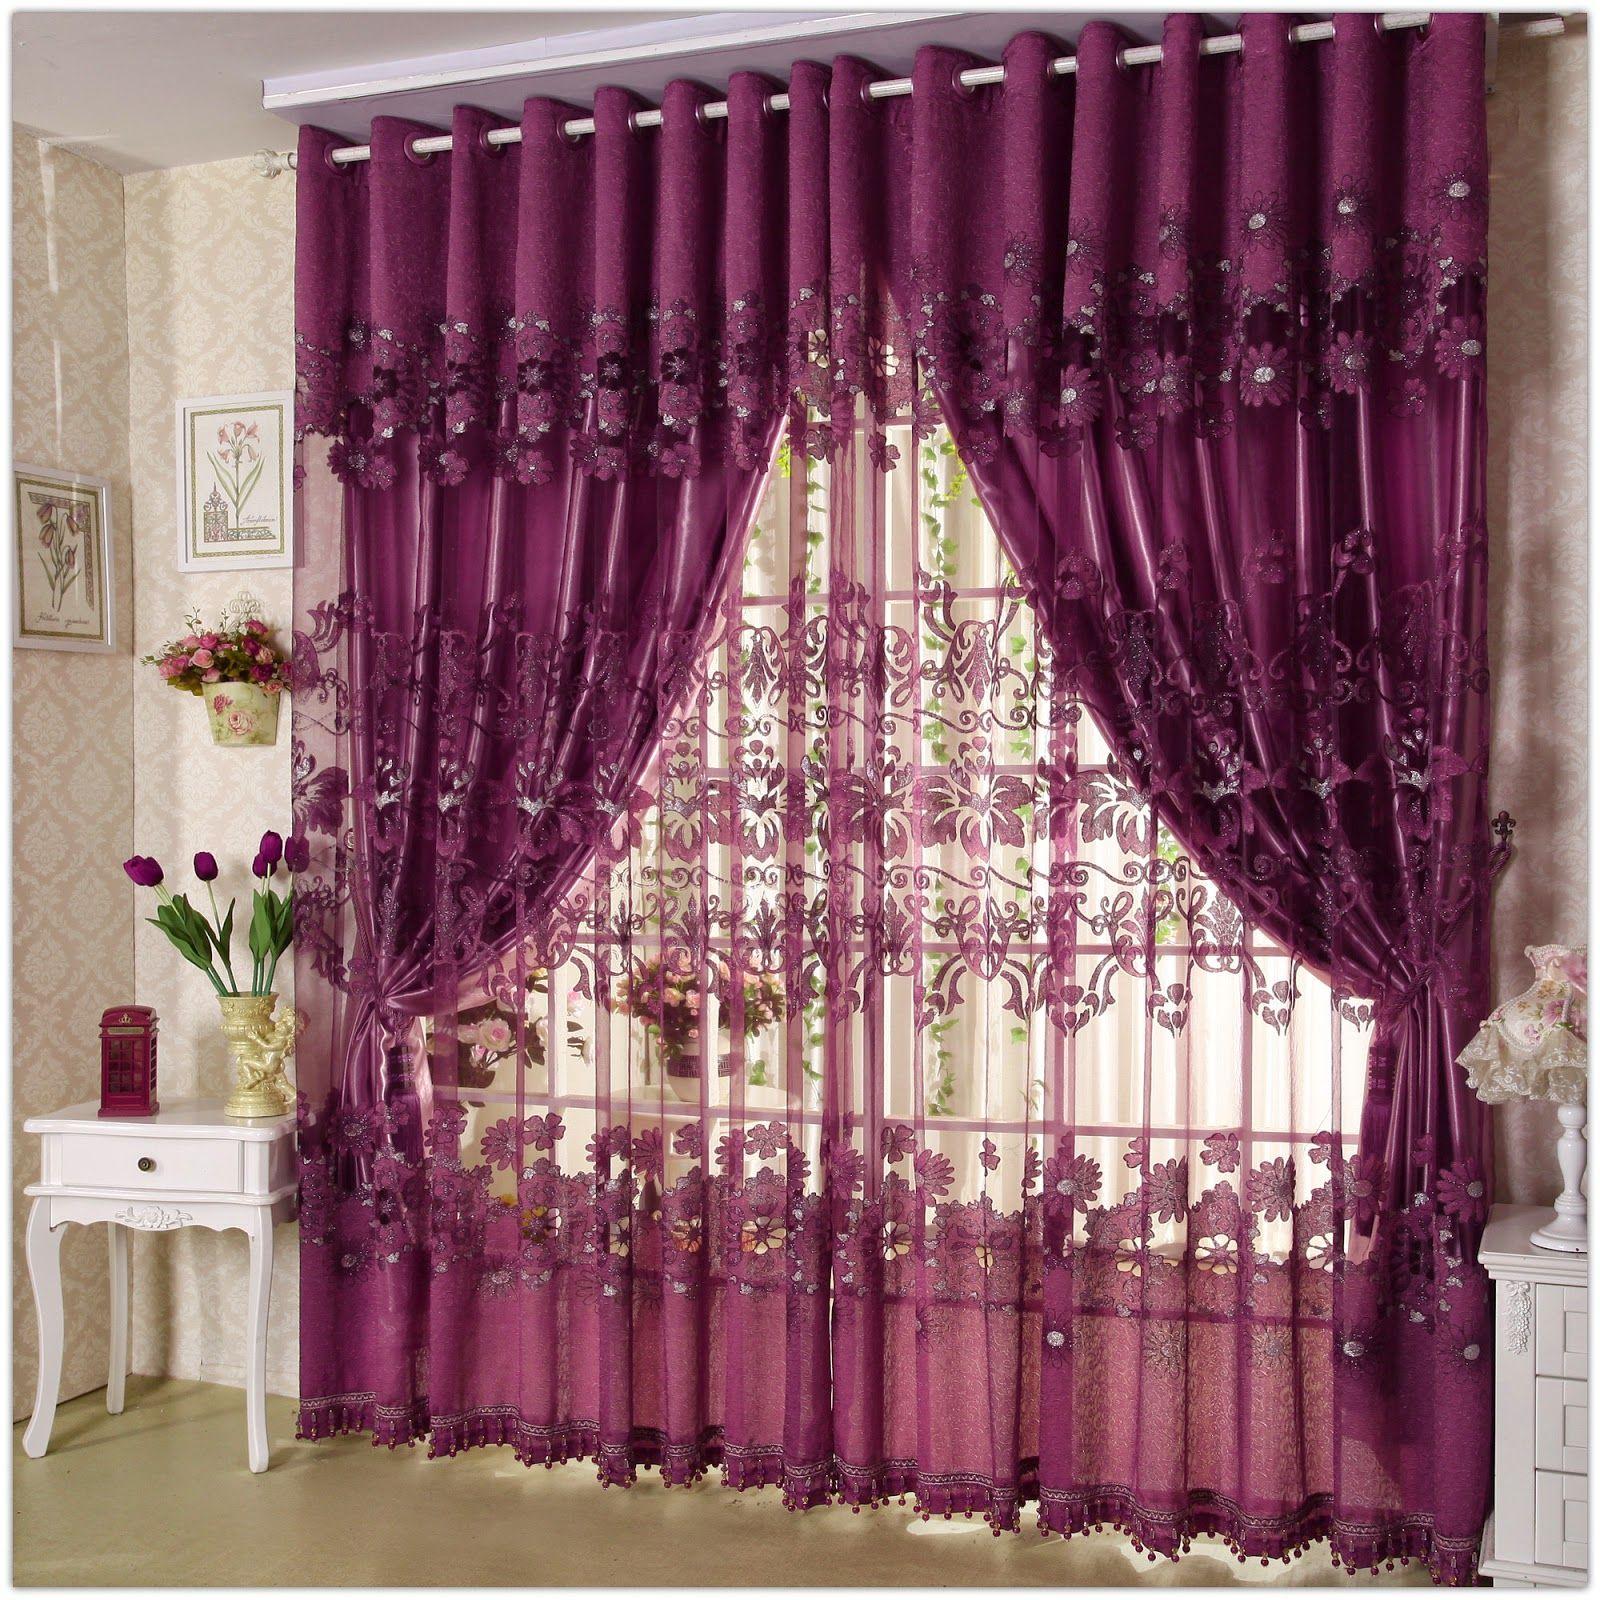 Unique curtain designs for living room window decorations